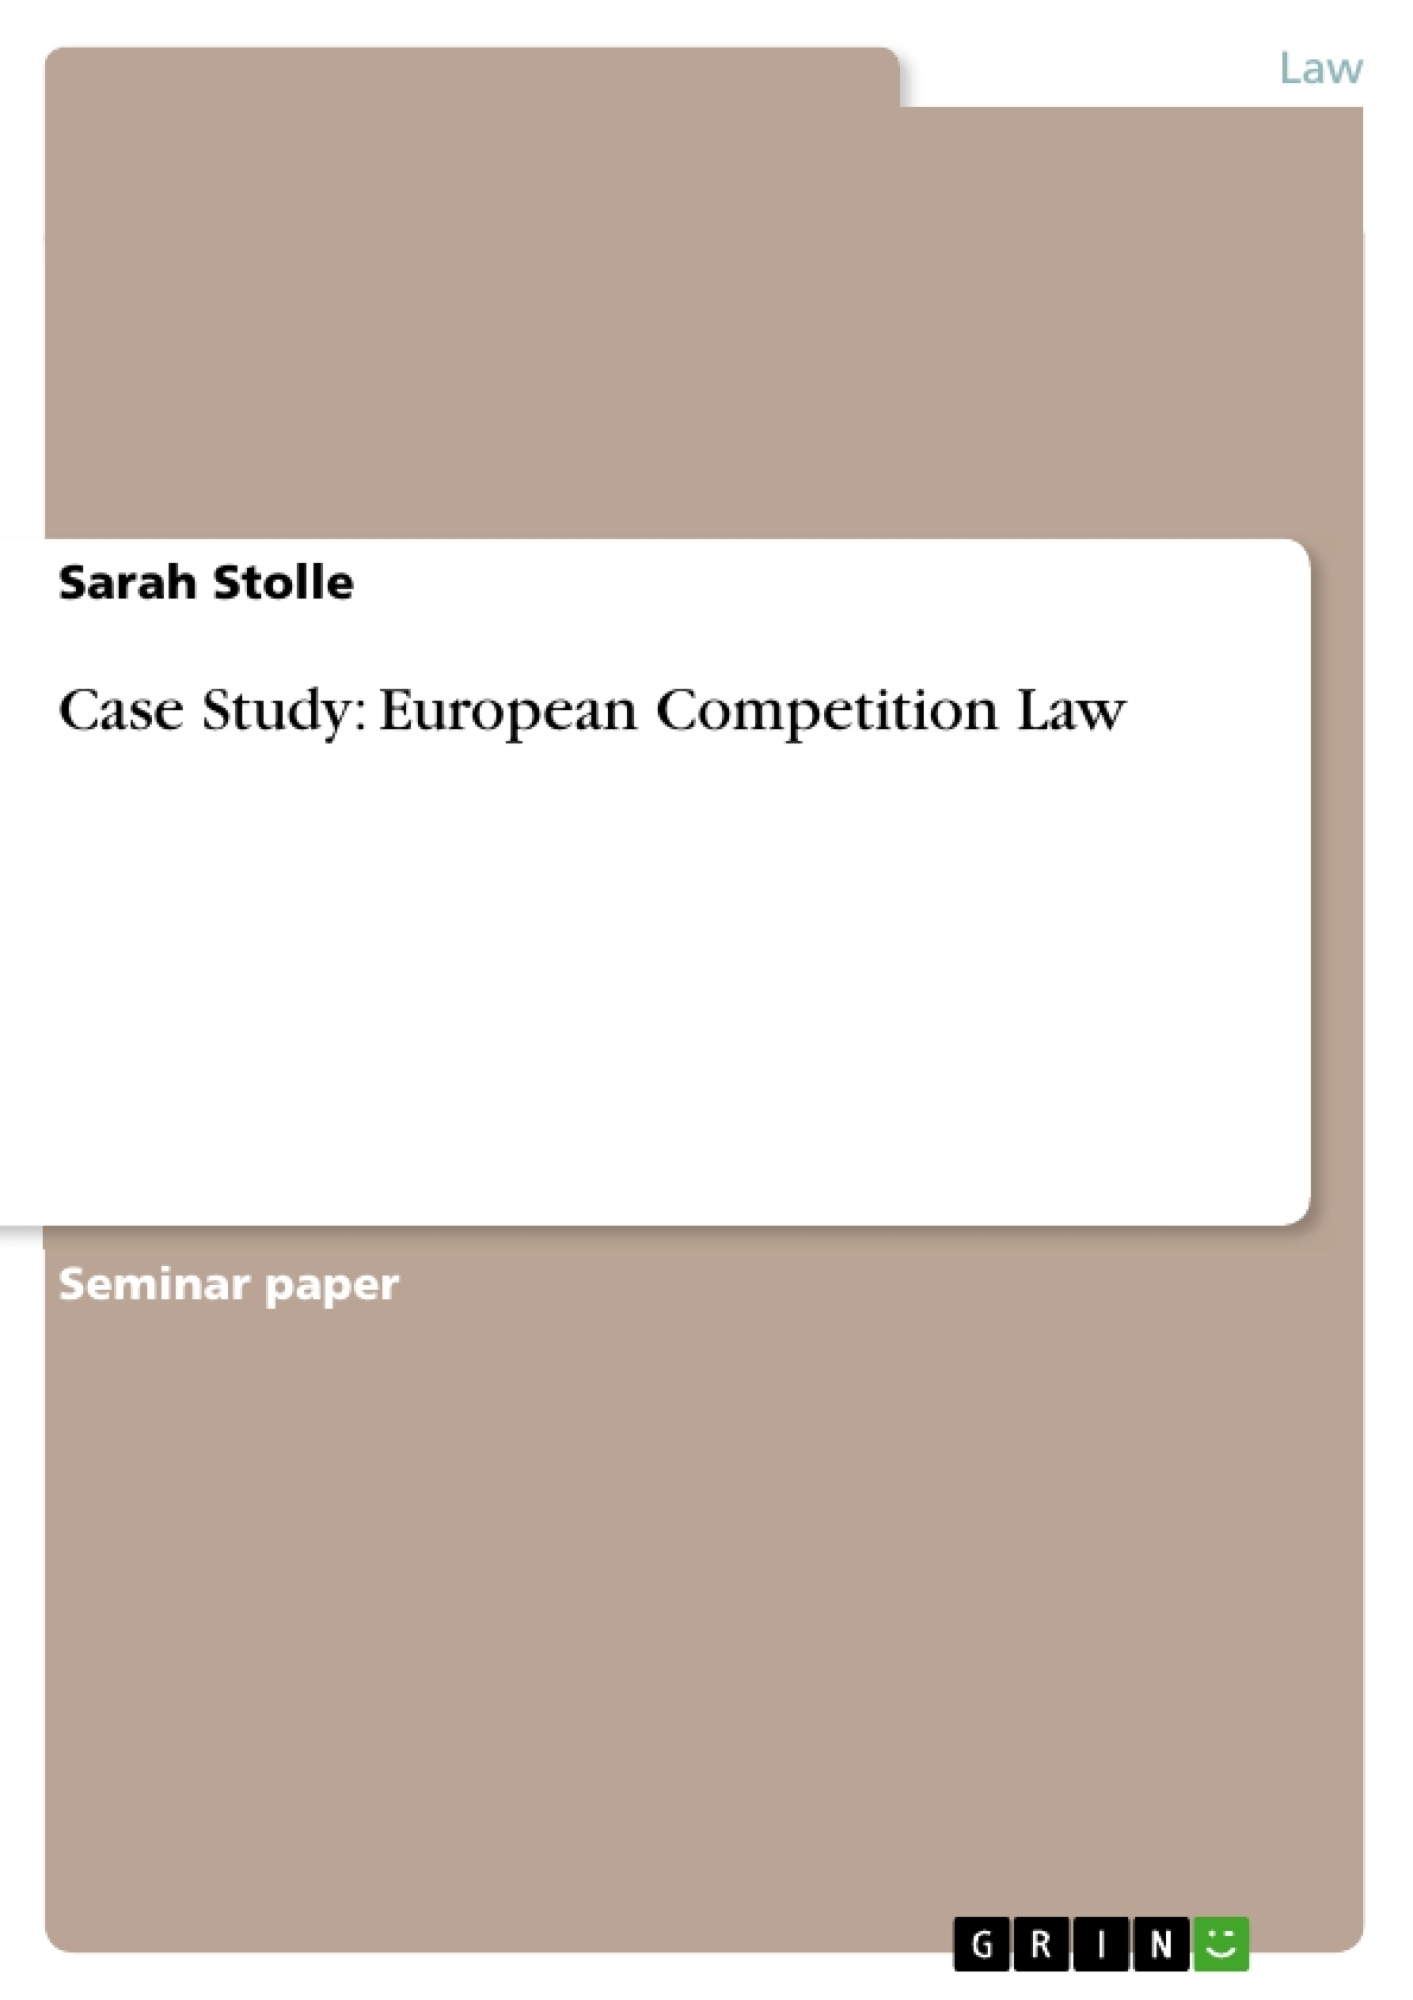 Title: Case Study: European Competition Law